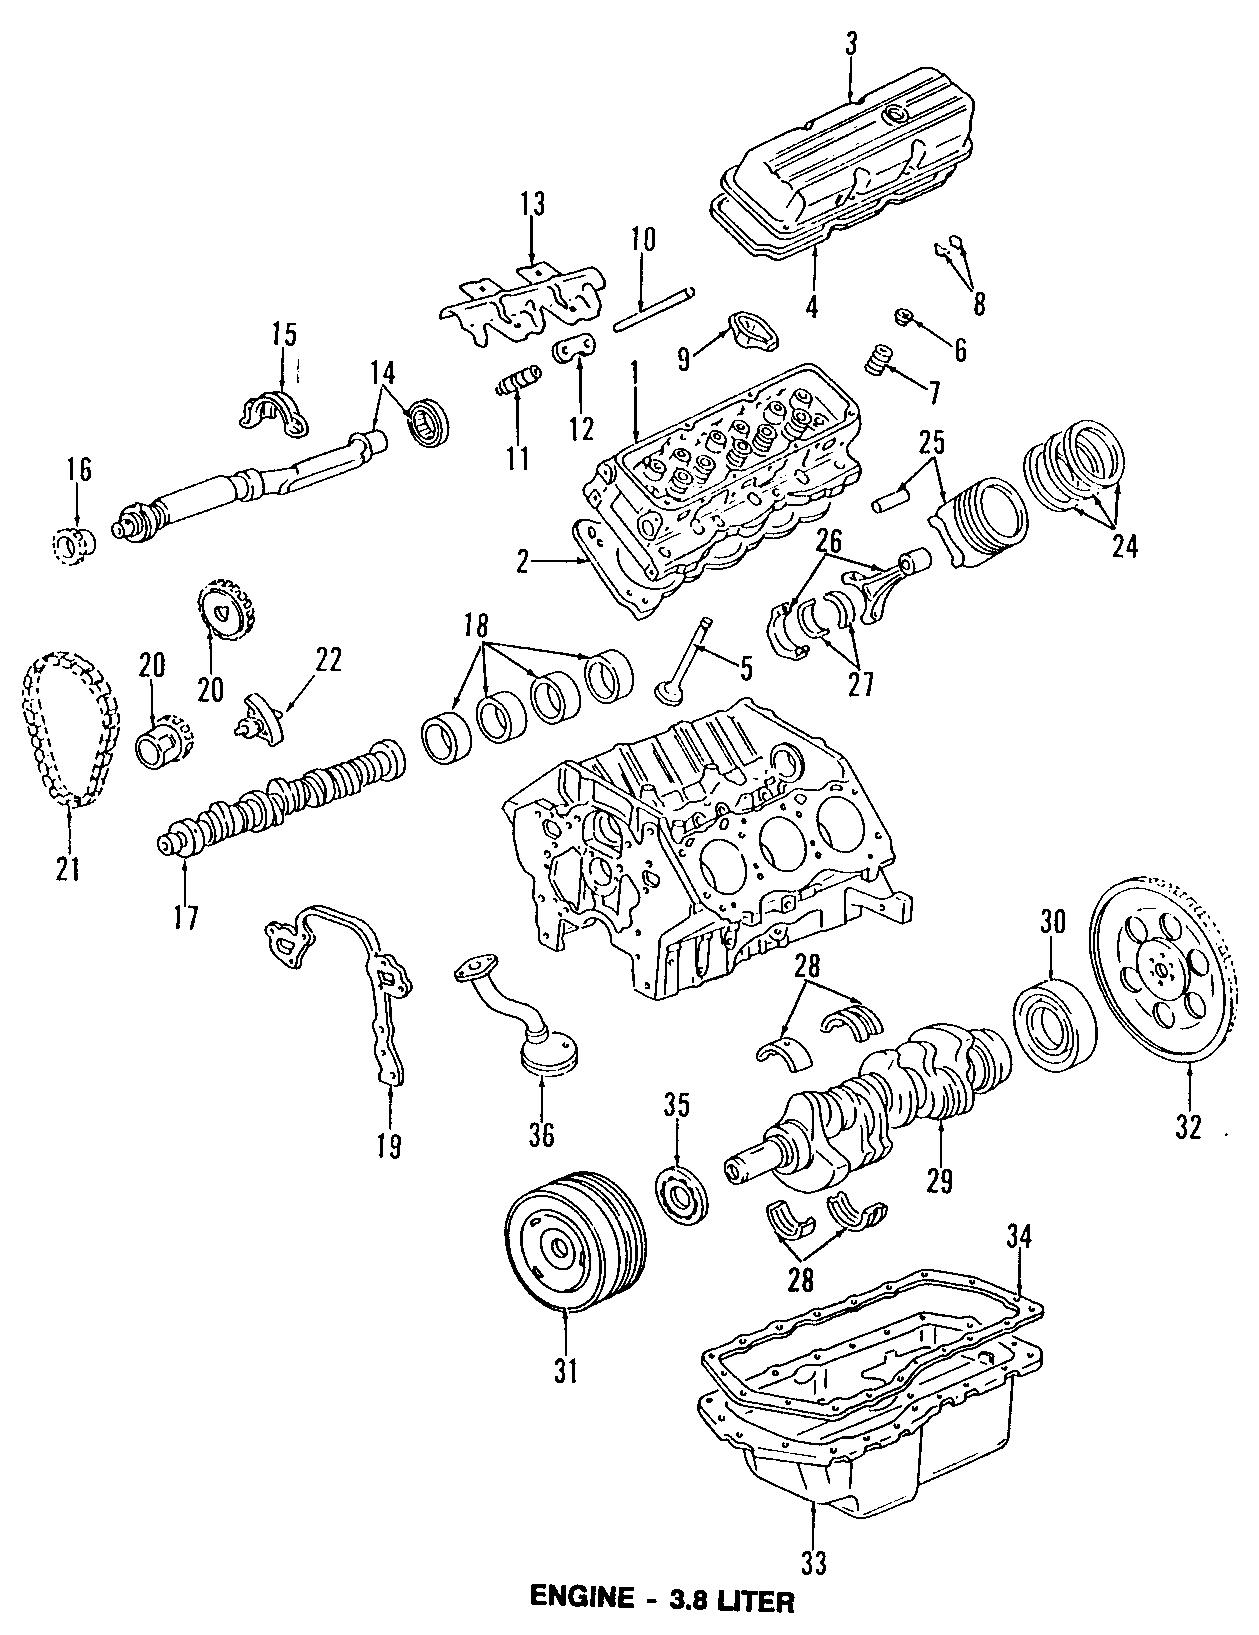 Buick Riviera Engine Piston